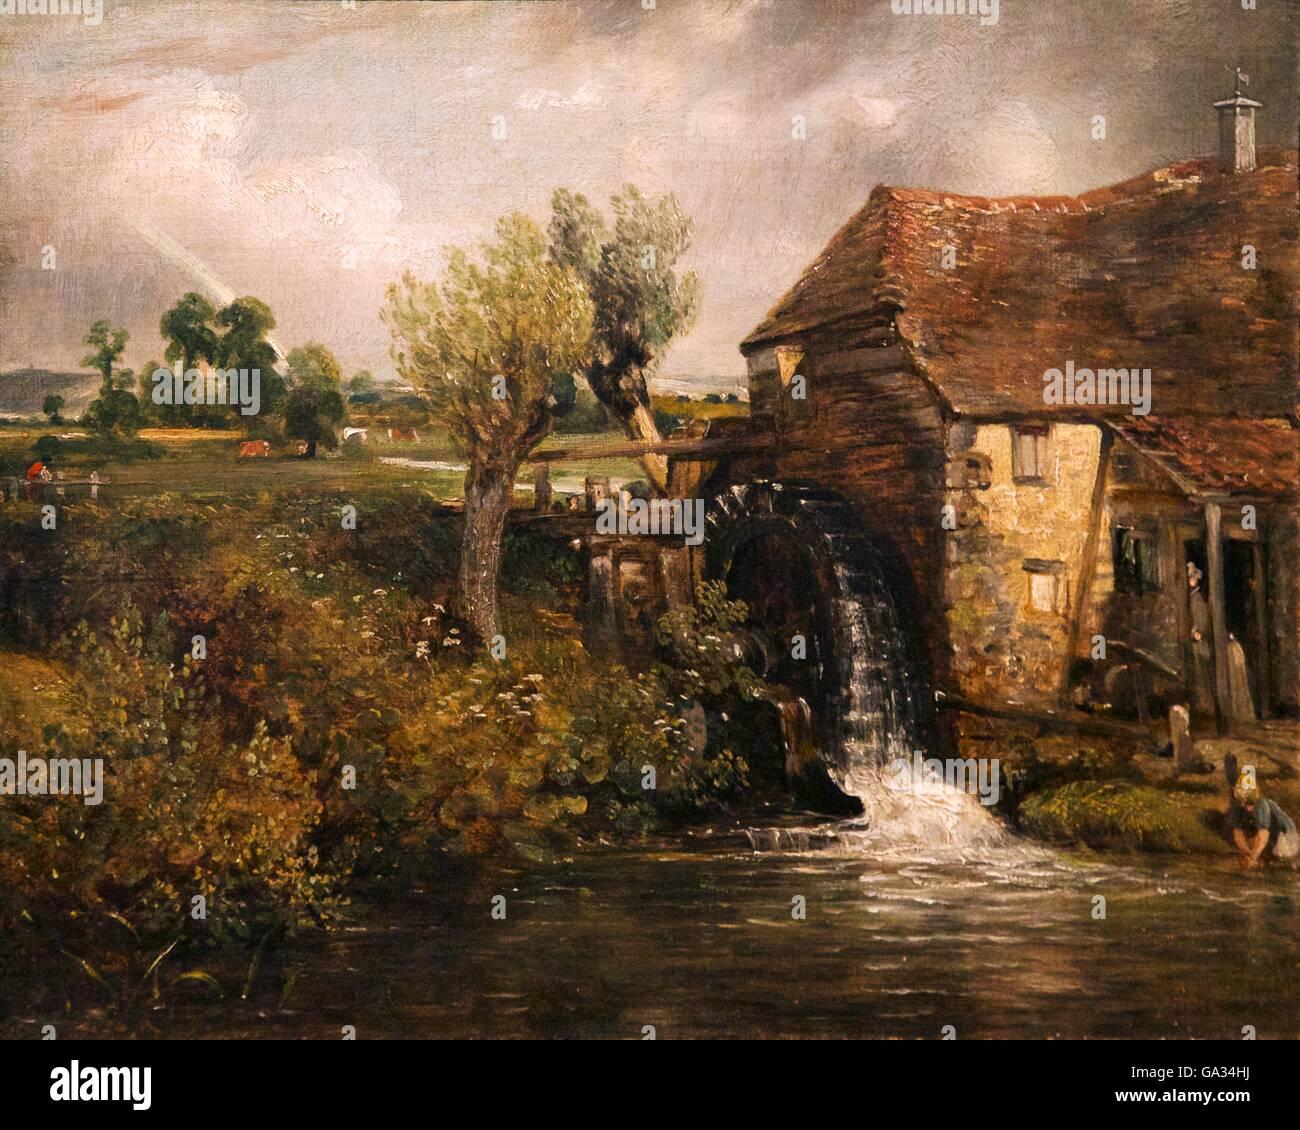 Parham's Mill, Gillingham, by John Constable, 1824, Fitzwilliam Museum, Cambridge, England, UK, GB - Stock Image